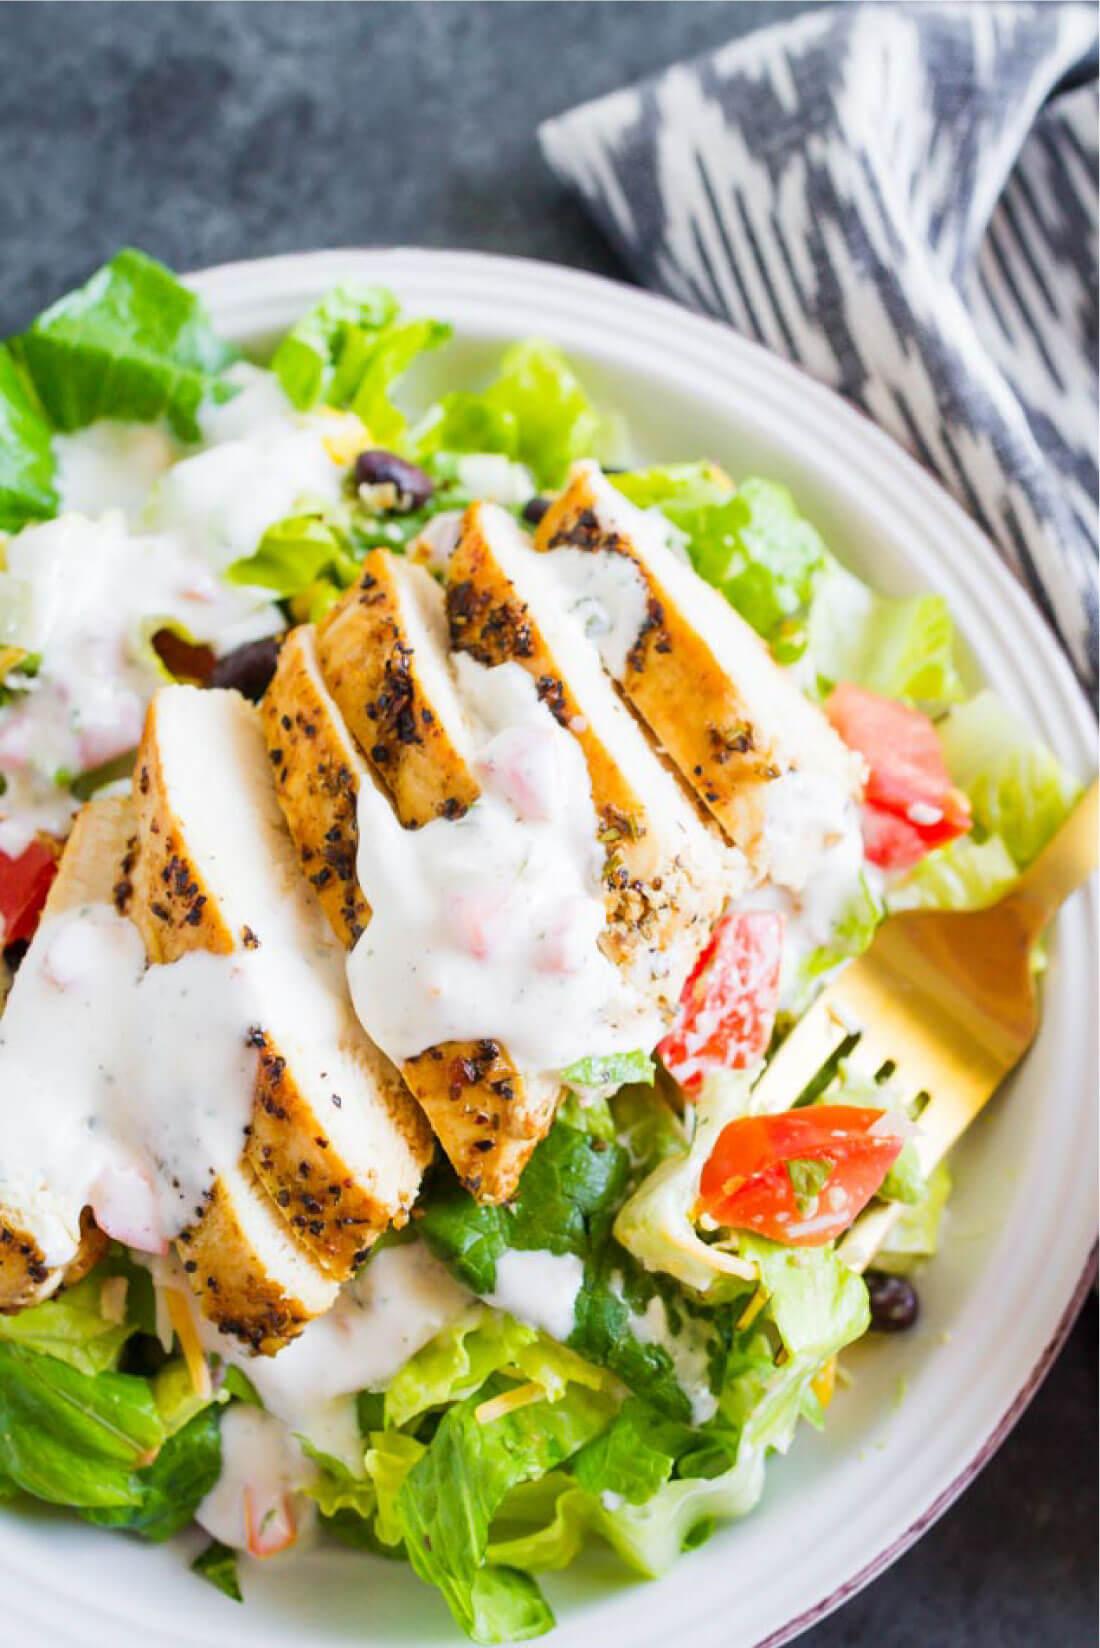 Santa Fe Chicken Salad - a simple, refreshing salad recipe that's perfect for summer! www.thirtyhandmadedays.com